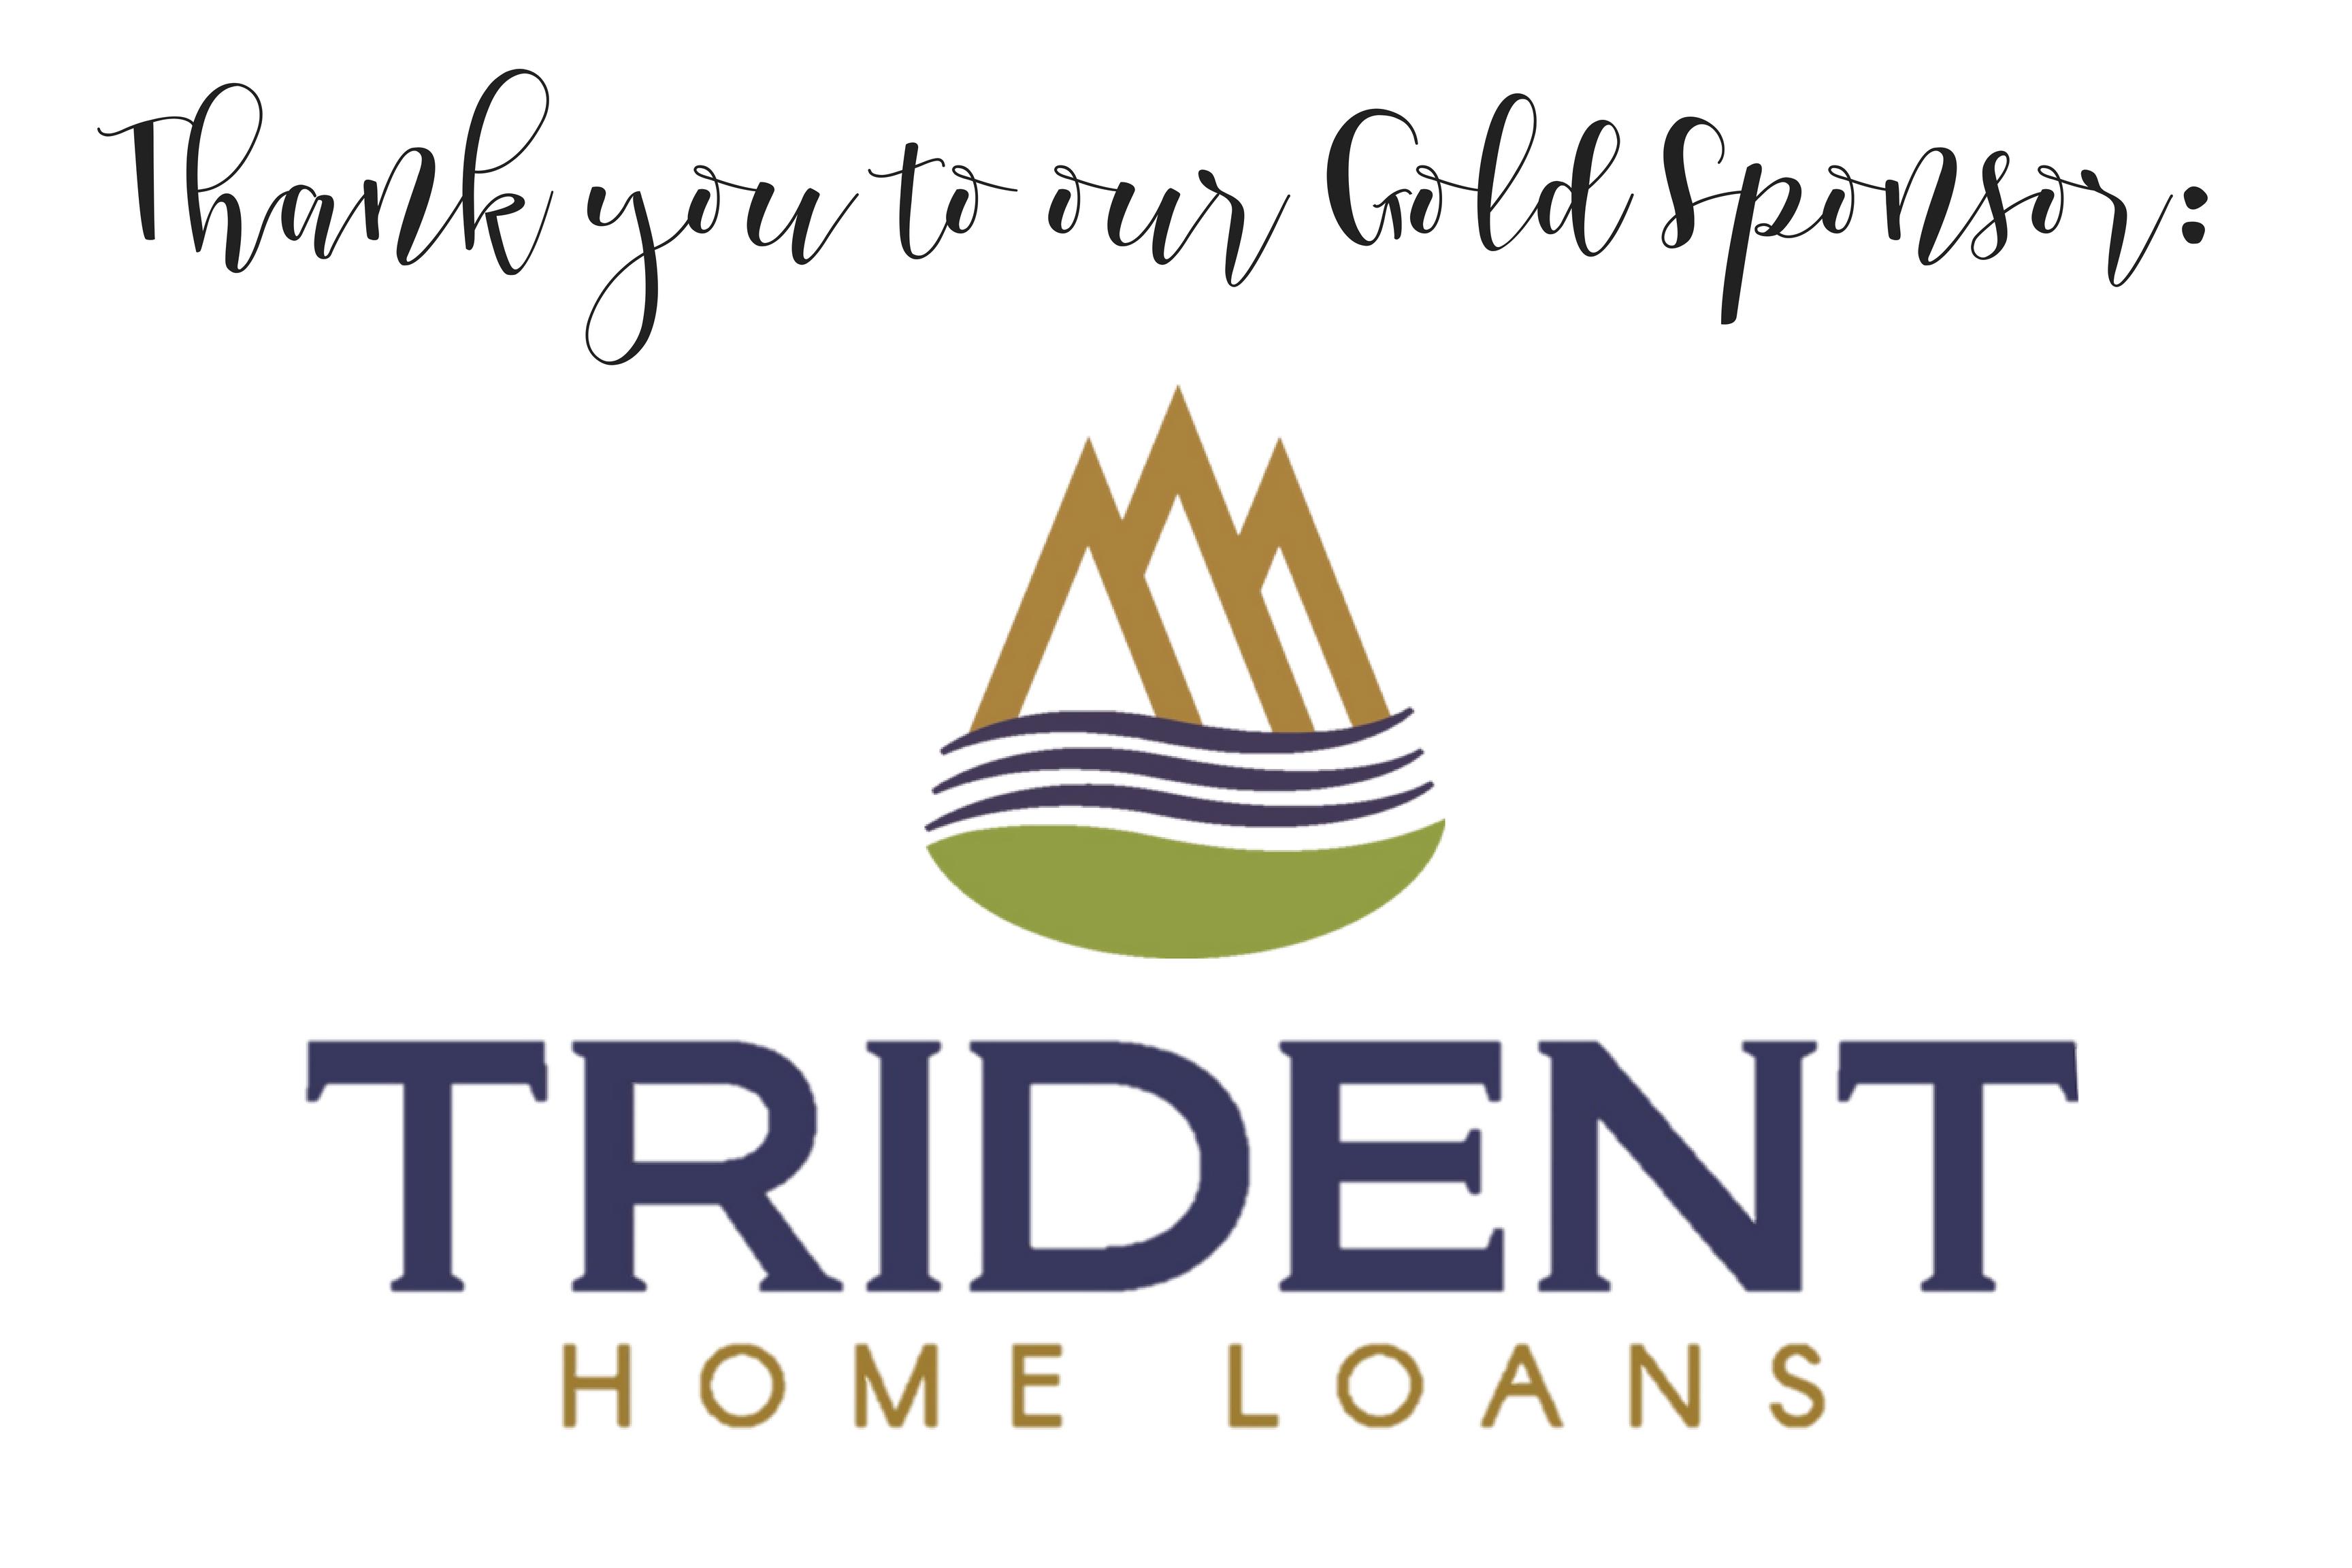 Trident sponsor sign